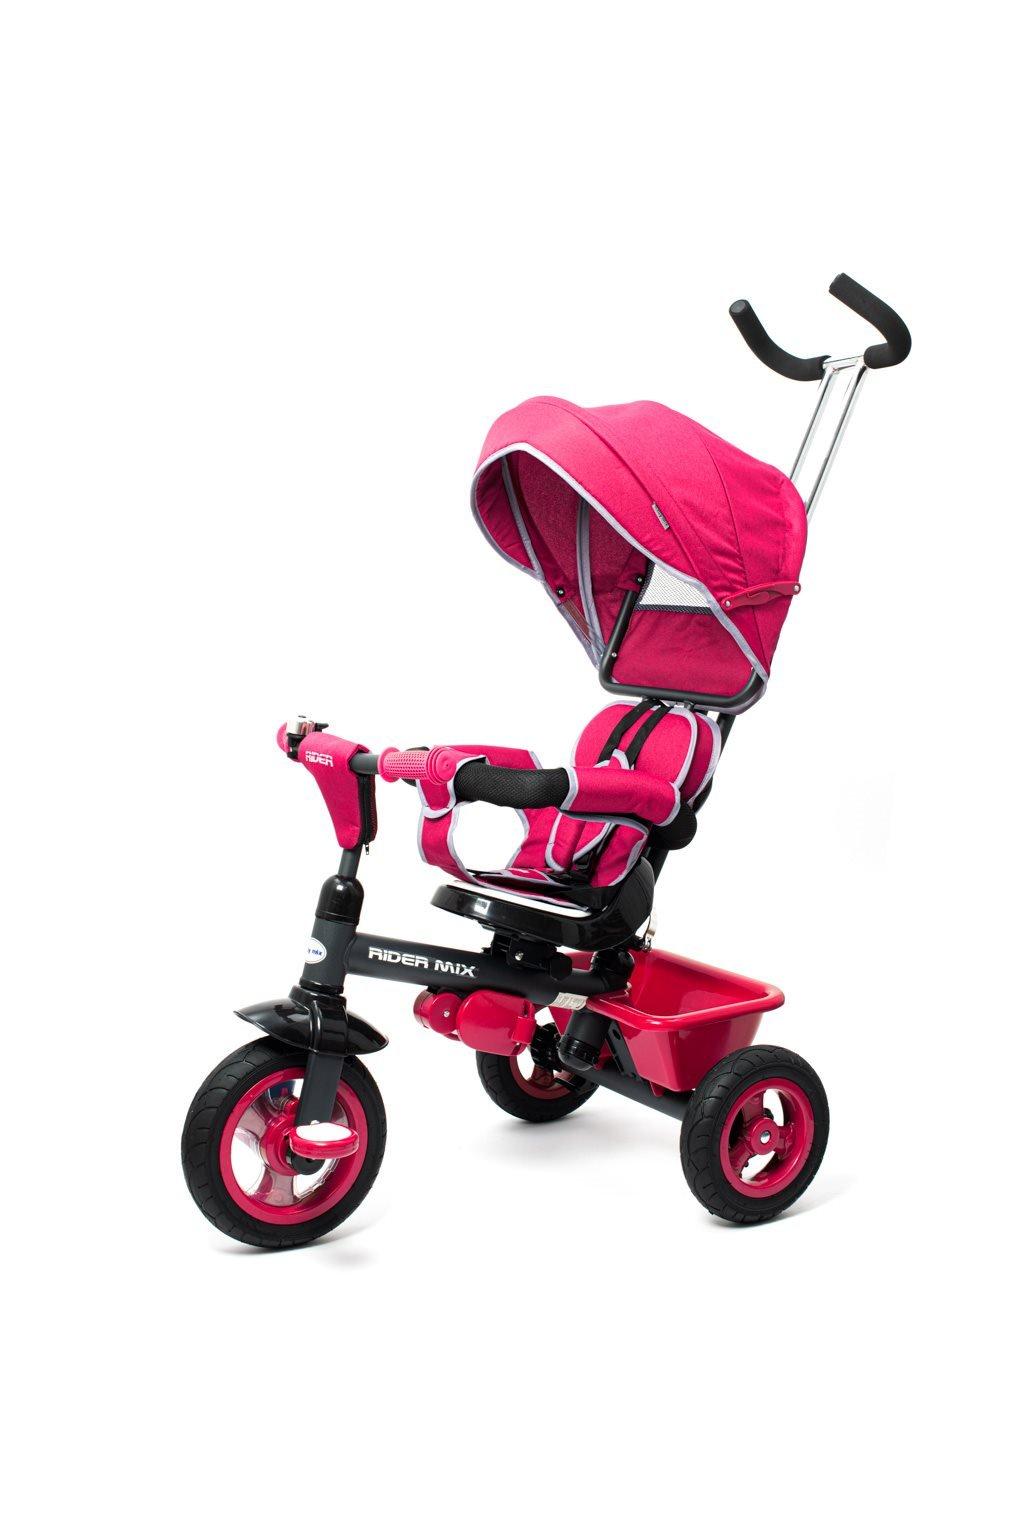 Detská trojkolka Baby Mix 5v1 RIDER 360° ružová